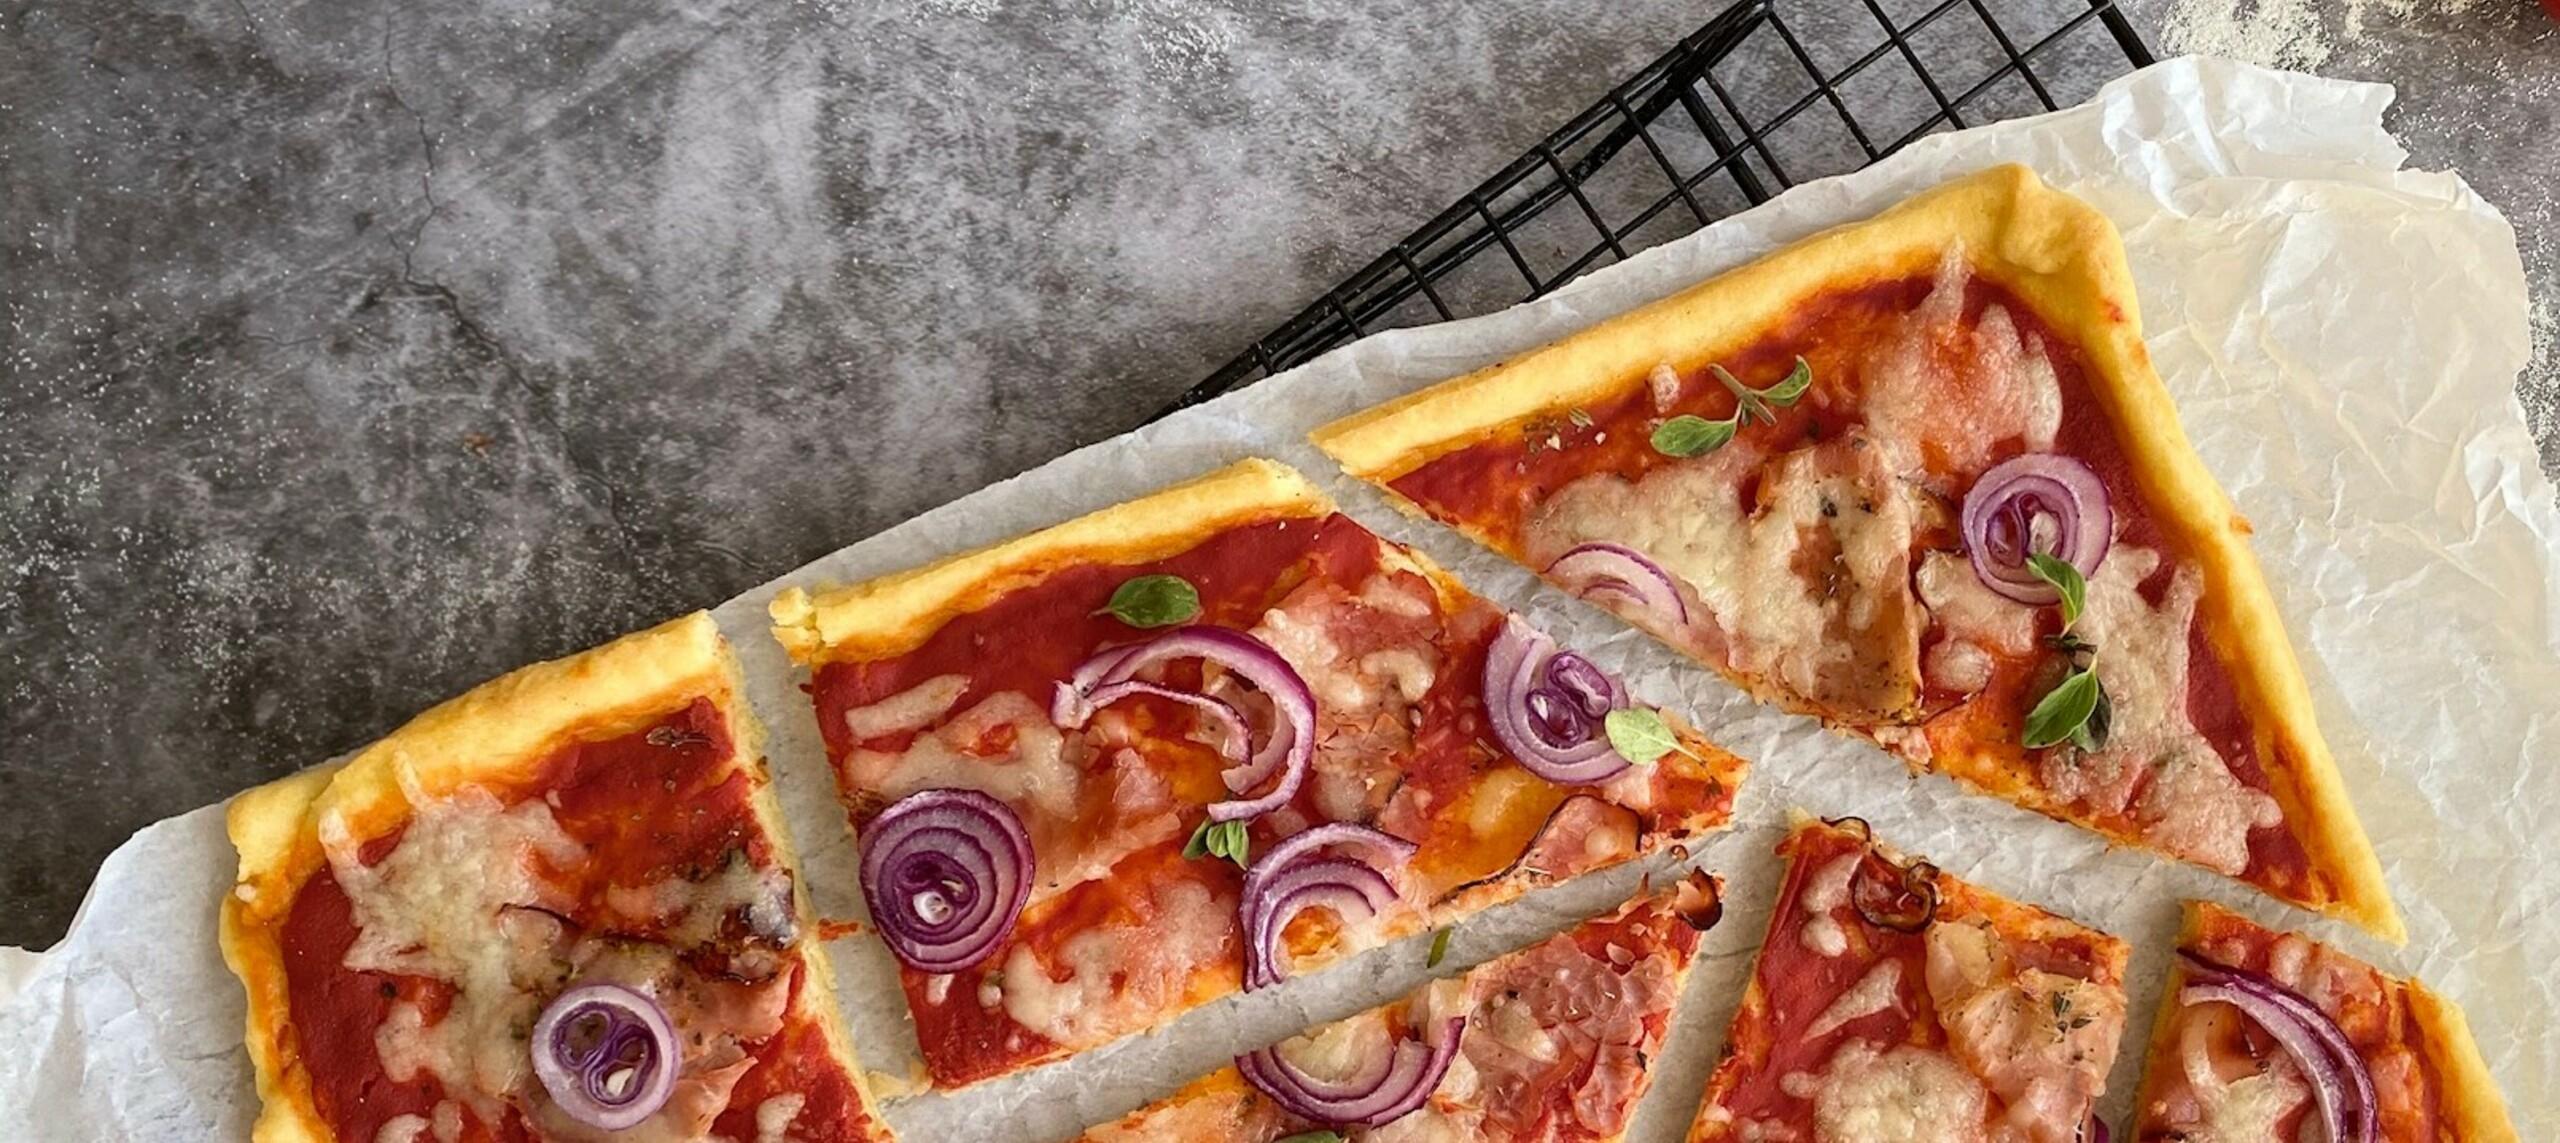 Quark-Öl-Pizzateig